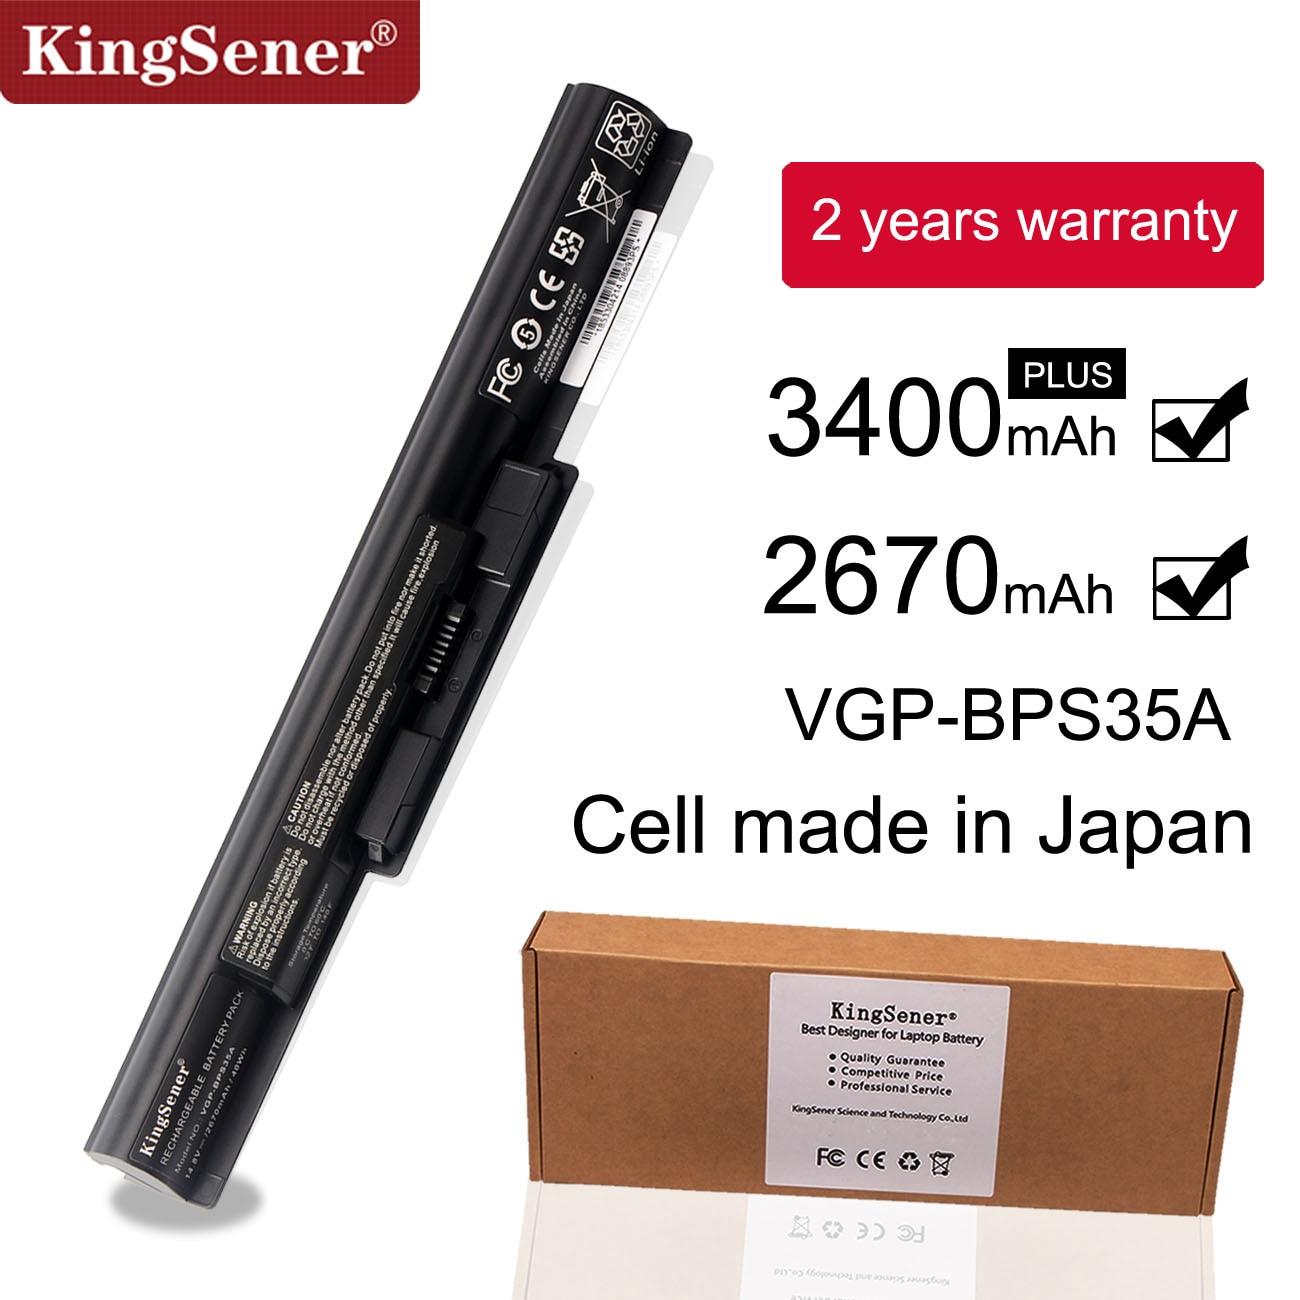 vgp bps35a - KingSener Japanese Cell VGP-BPS35A Battery For SONY Vaio Fit 14E 15E SVF1521A2E SVF15217SC SVF14215SC SVF15218SC BPS35 BPS35A